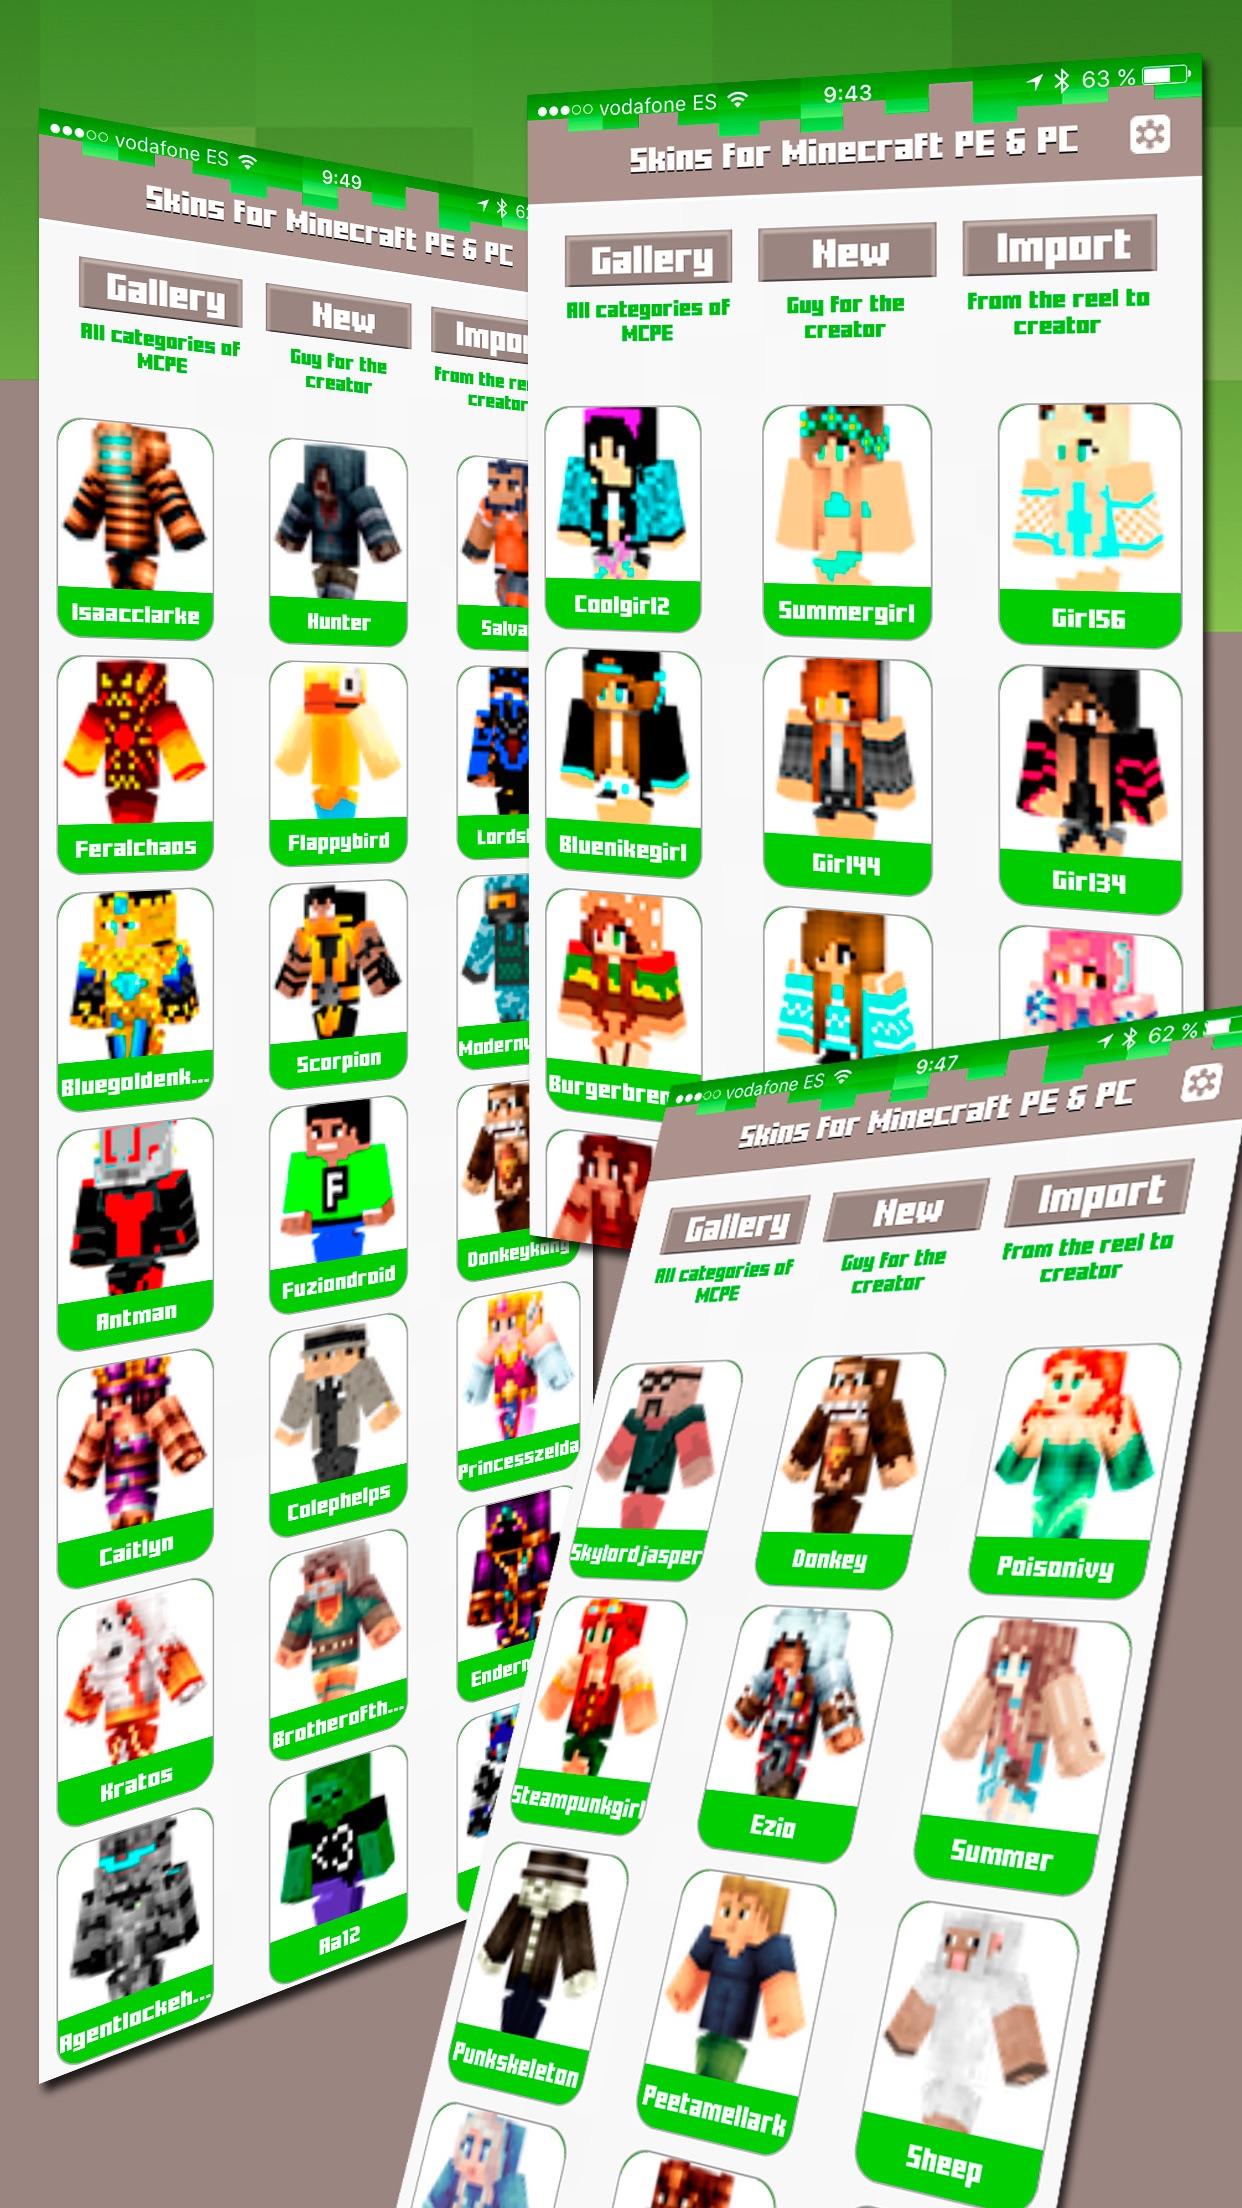 Skins for Minecraft PE & PC - Free Skins Screenshot